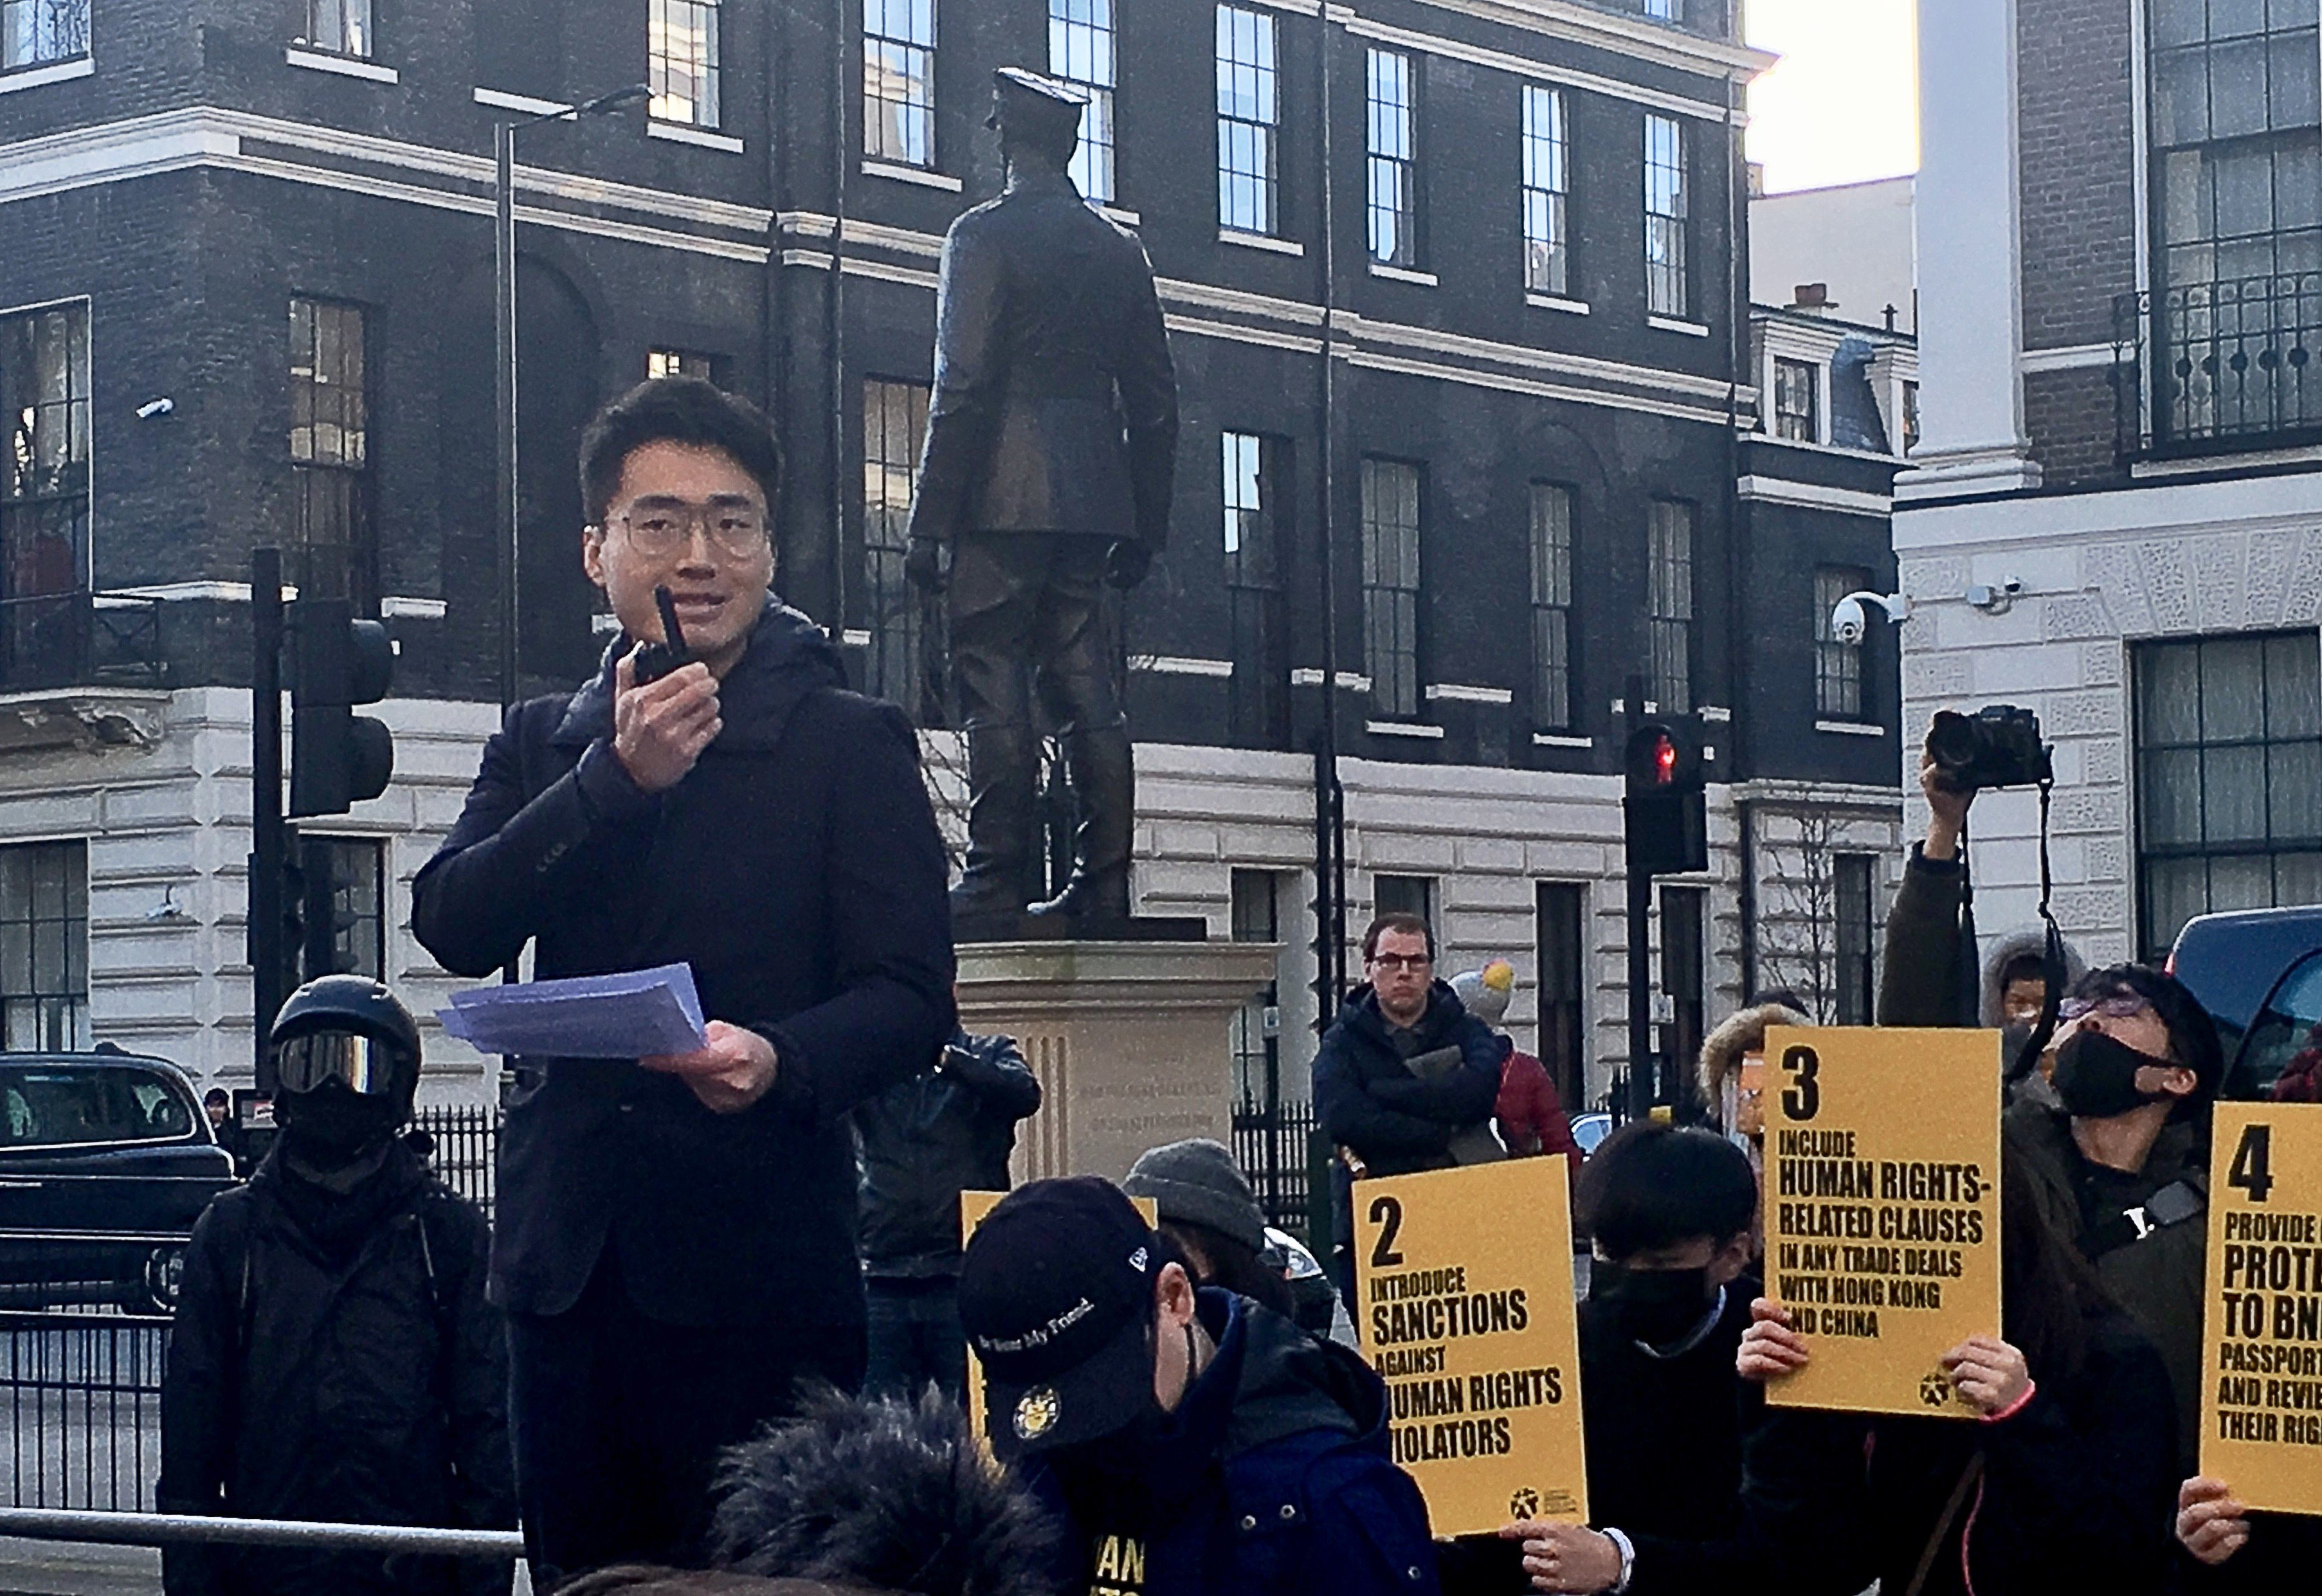 Simon Cheng: Hongkonger who was held in mainland China optimistic ...